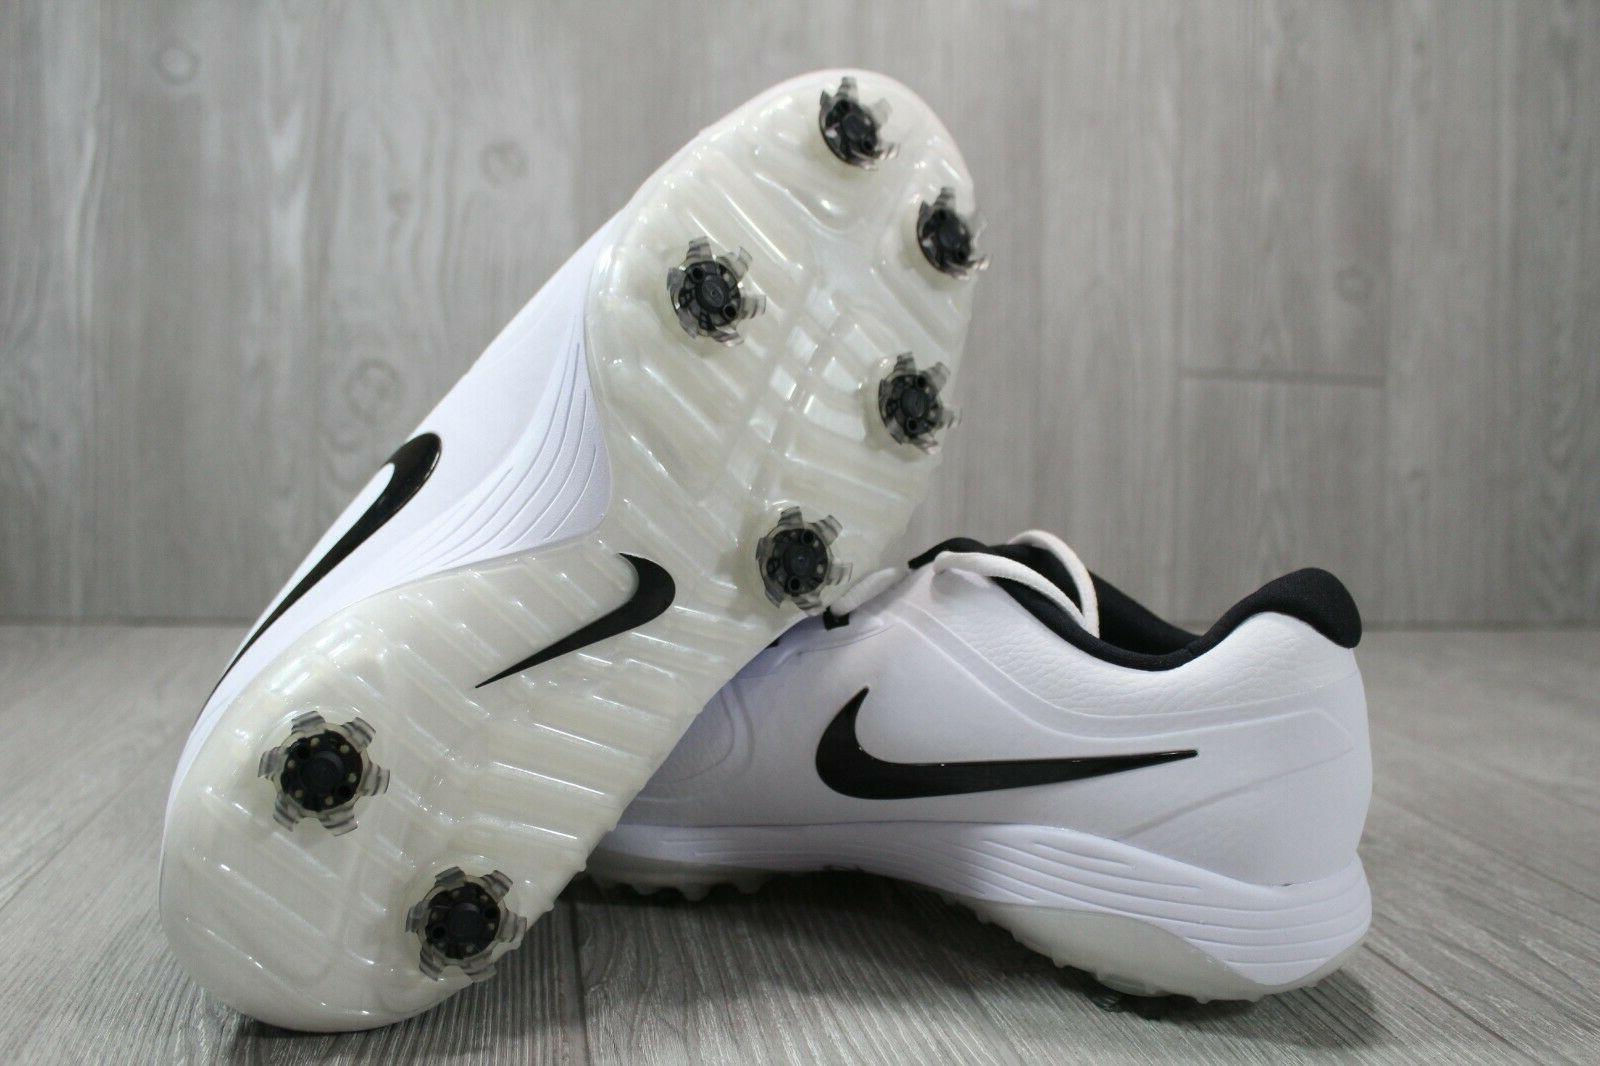 52 Nike Men's AQ2197-101 Black 8 -